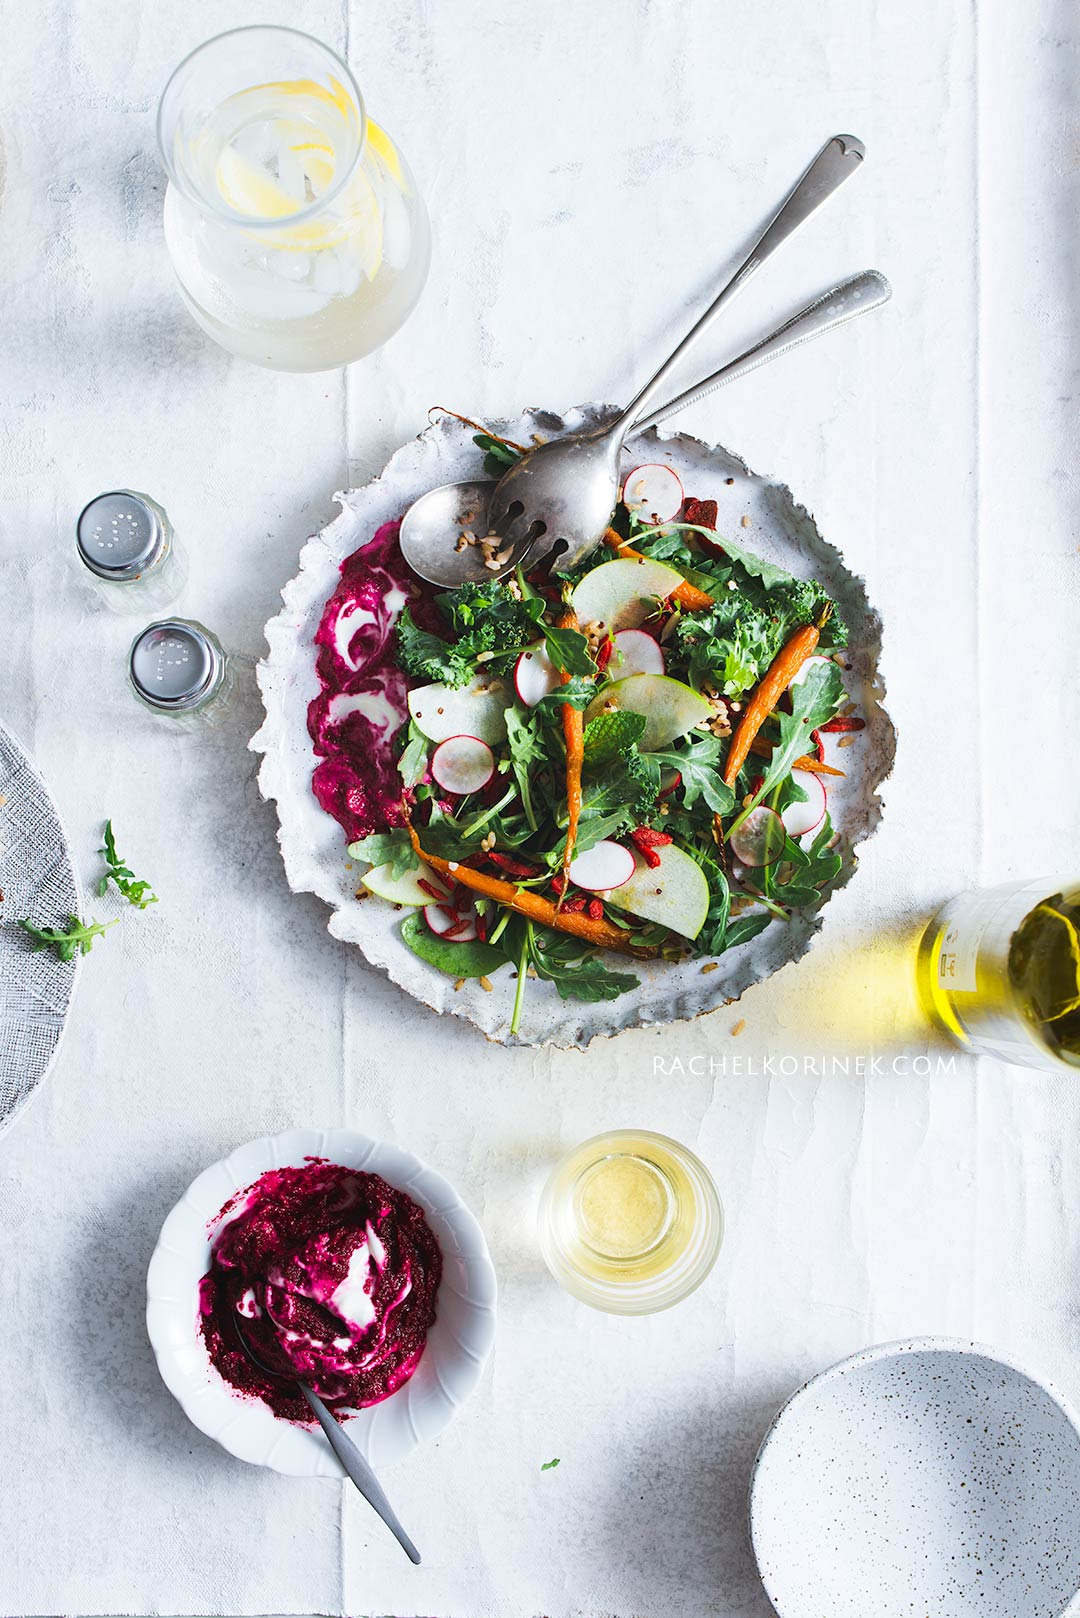 Rachel Korinek Food Photographer Beetroot Labne Grain Salad  Click to check out my latest food photography projects.  #twolovesstudio #beautifulcuisine #foodbloggerpro #foodphotography #learnfoodphotography #foodblogger #learnphotography #foodstyling #lightingtips #naturallight #foodphotographer